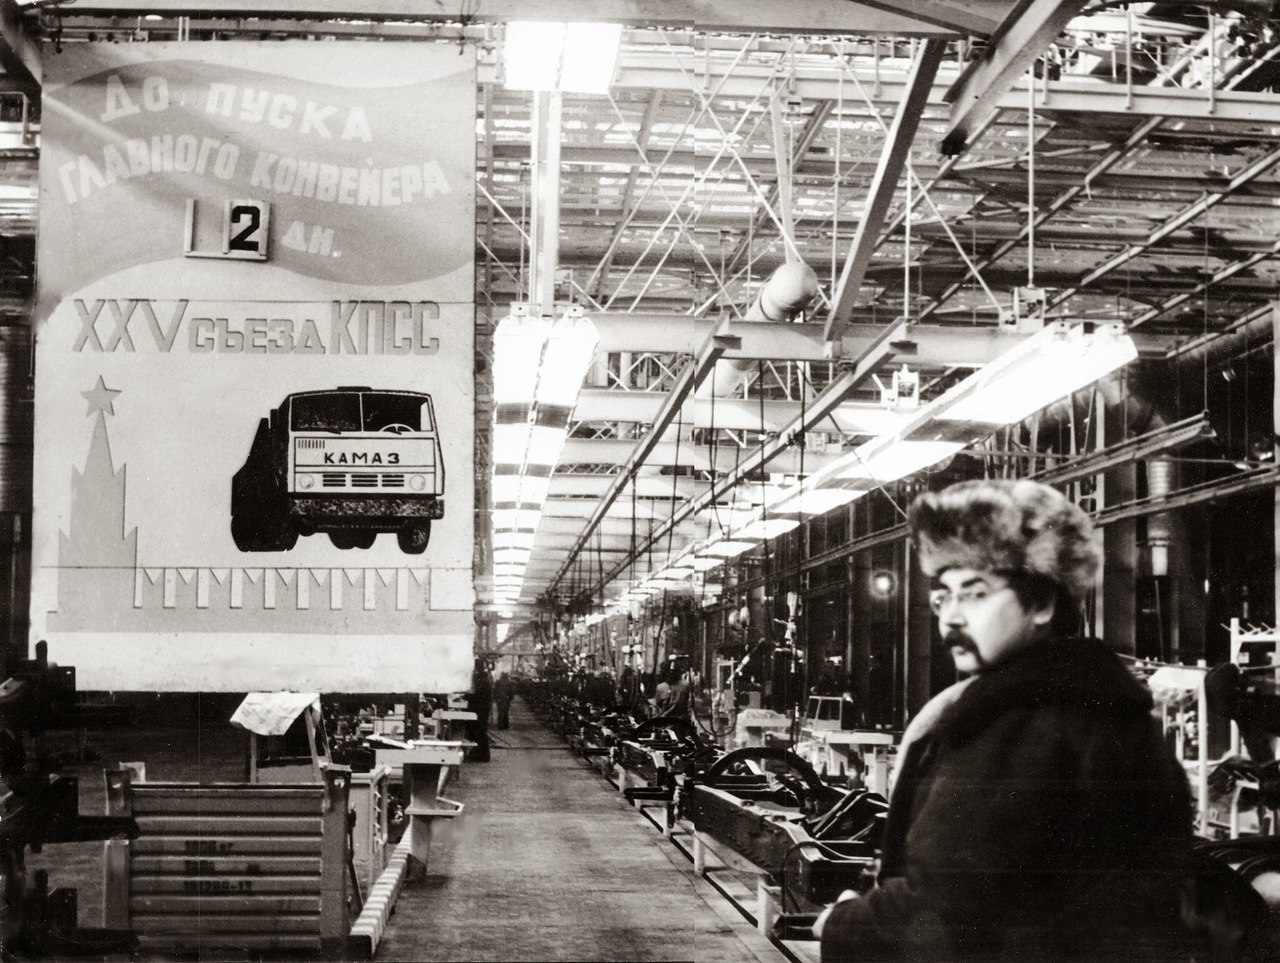 КАМАЗ-1974. Хроника строительства